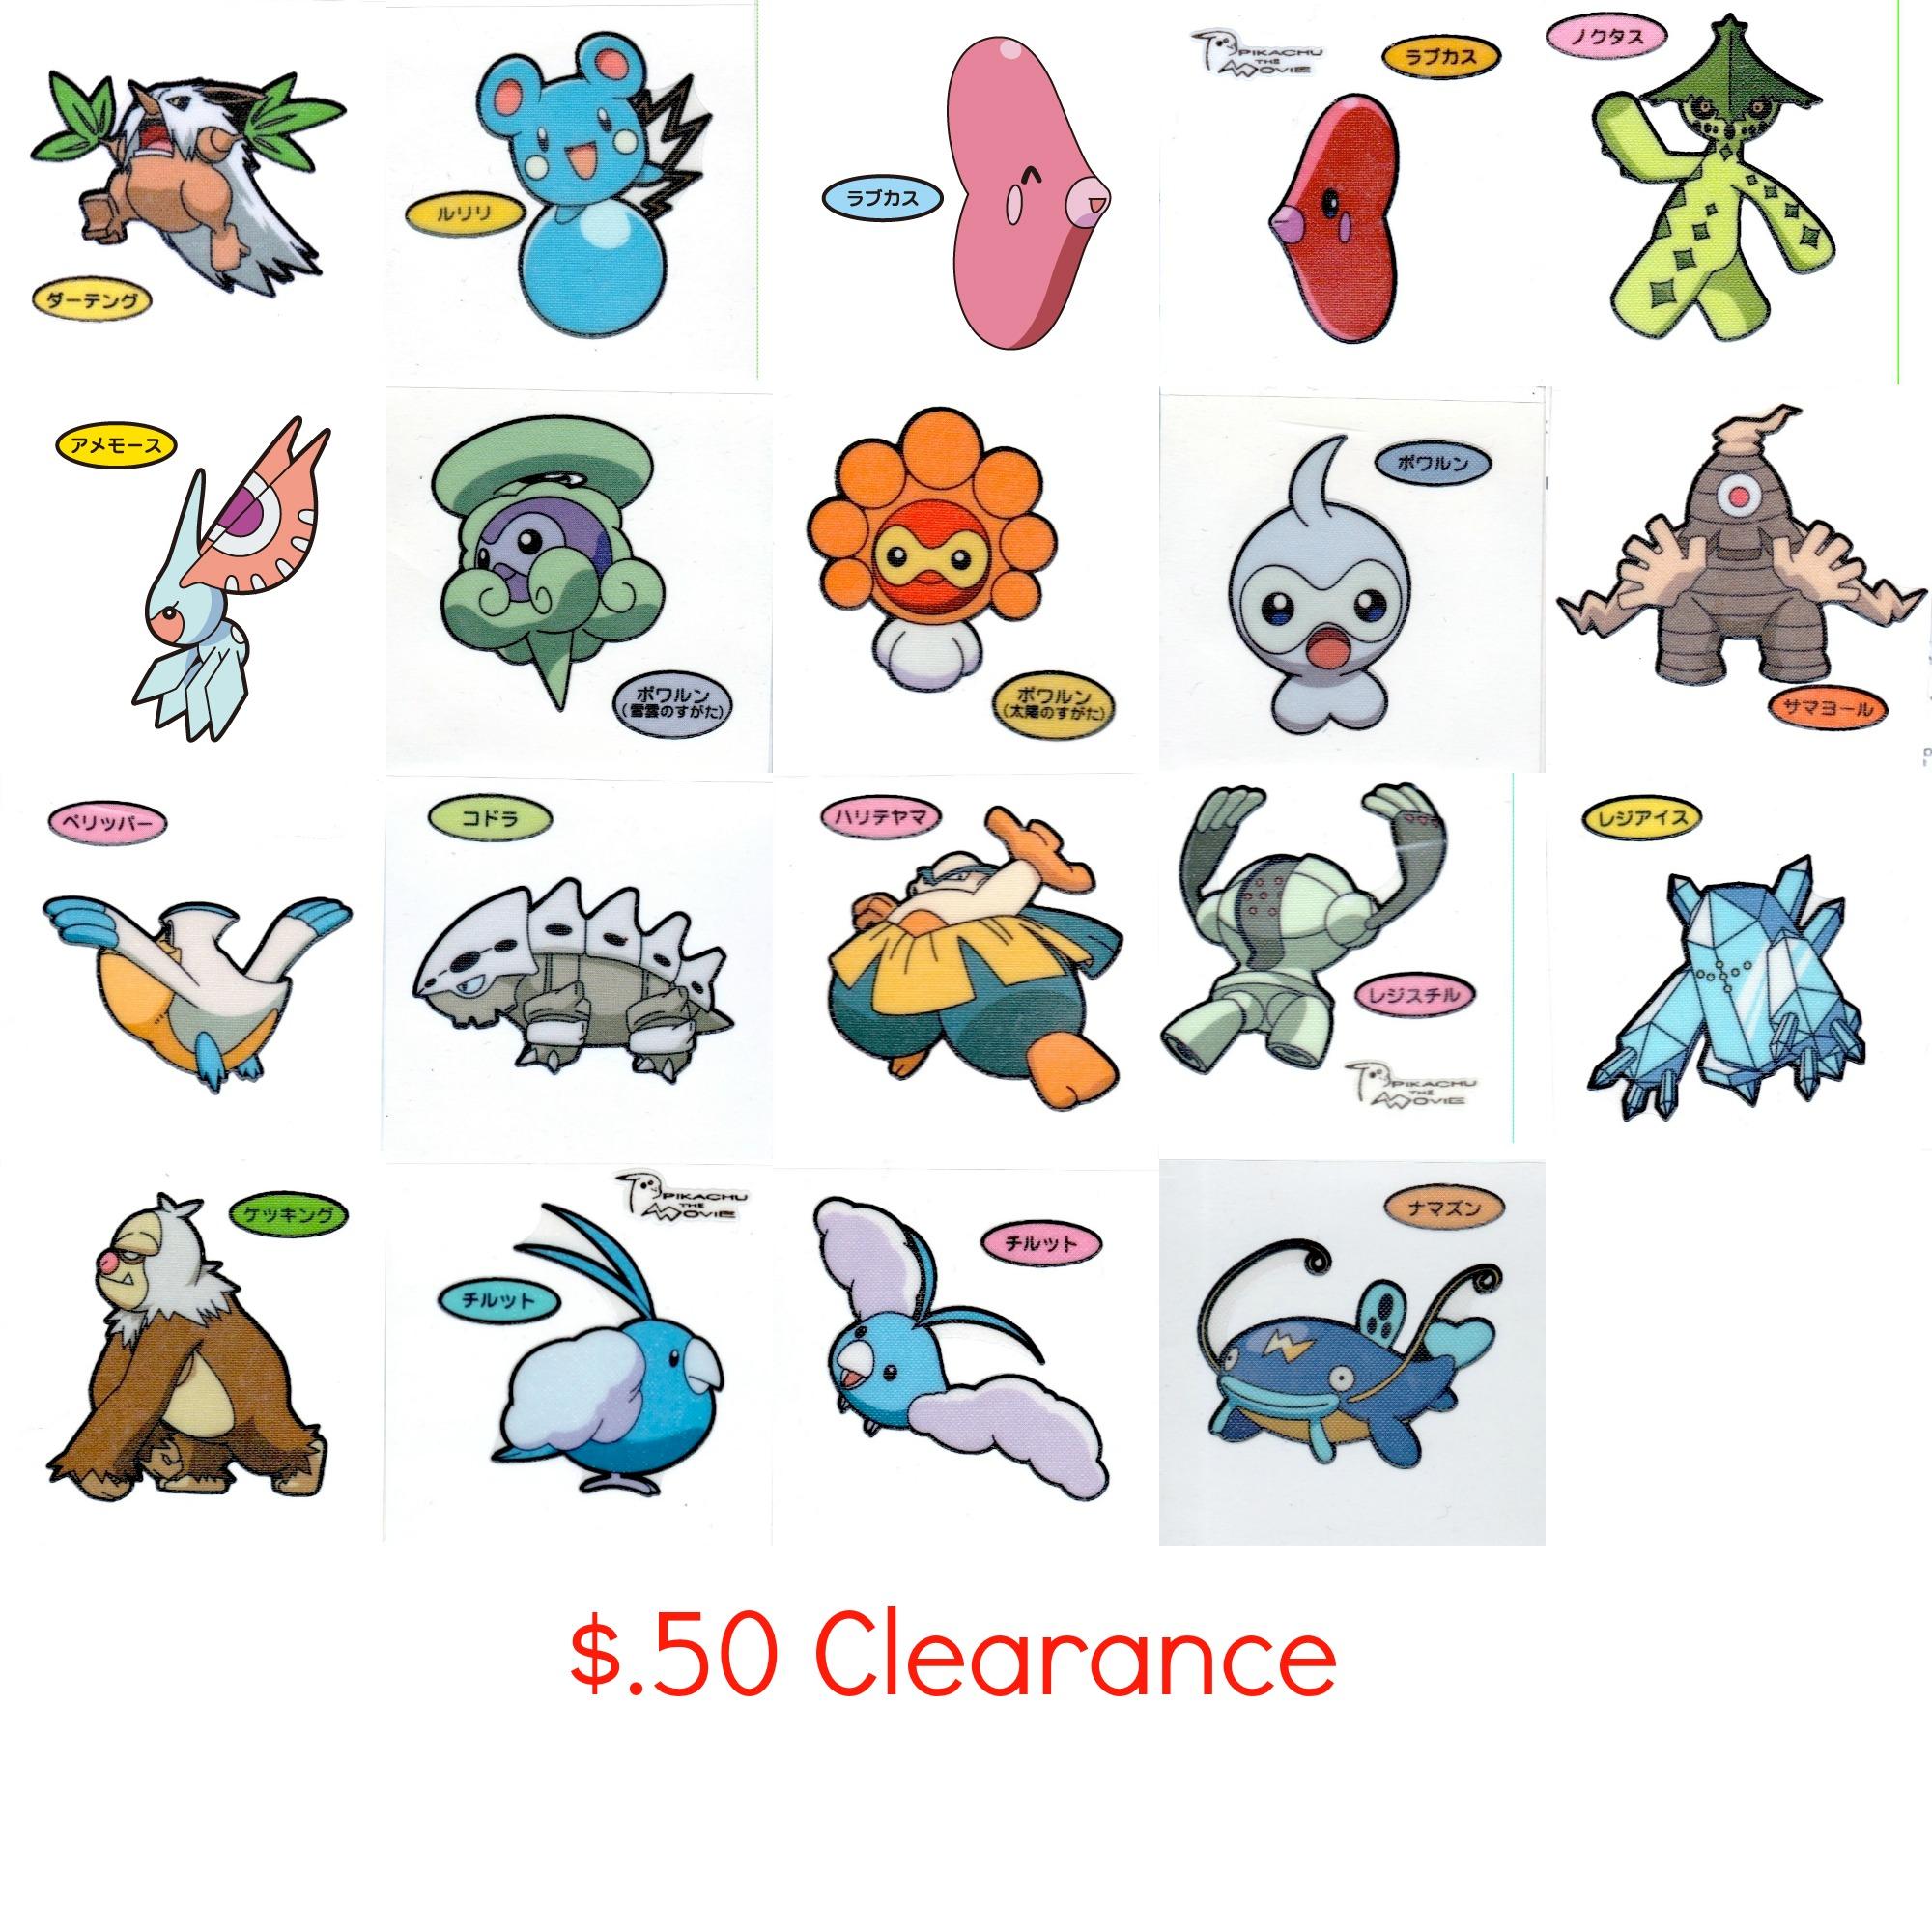 50clearance